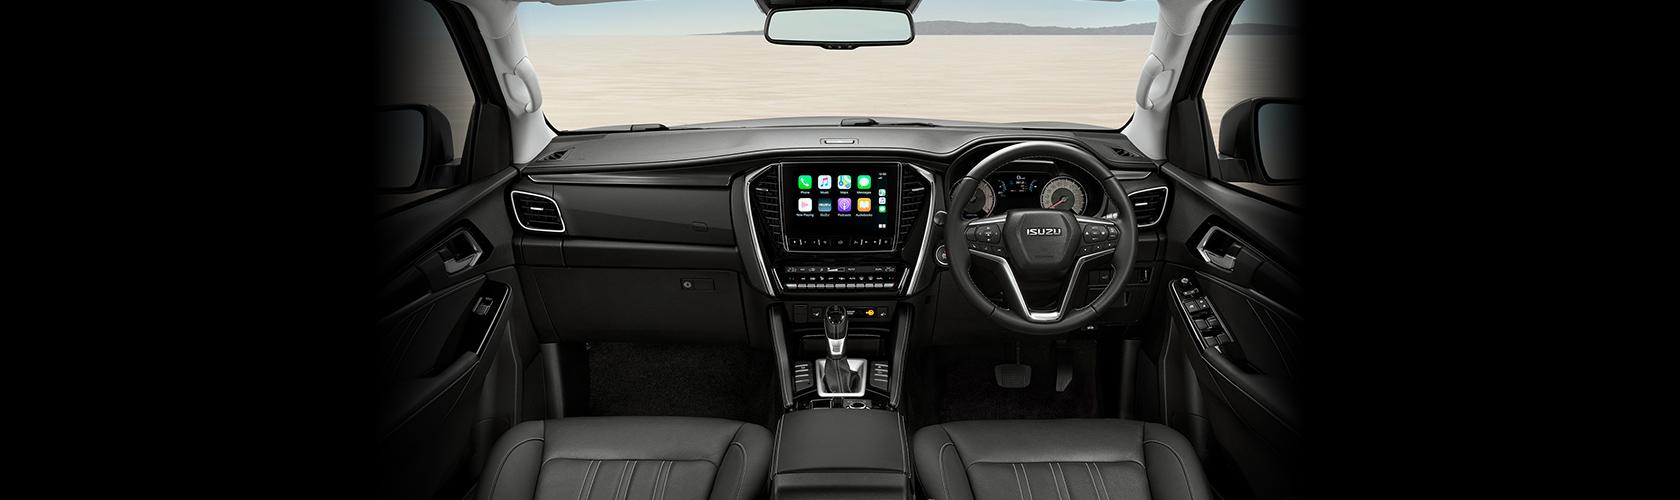 Cockpit Image